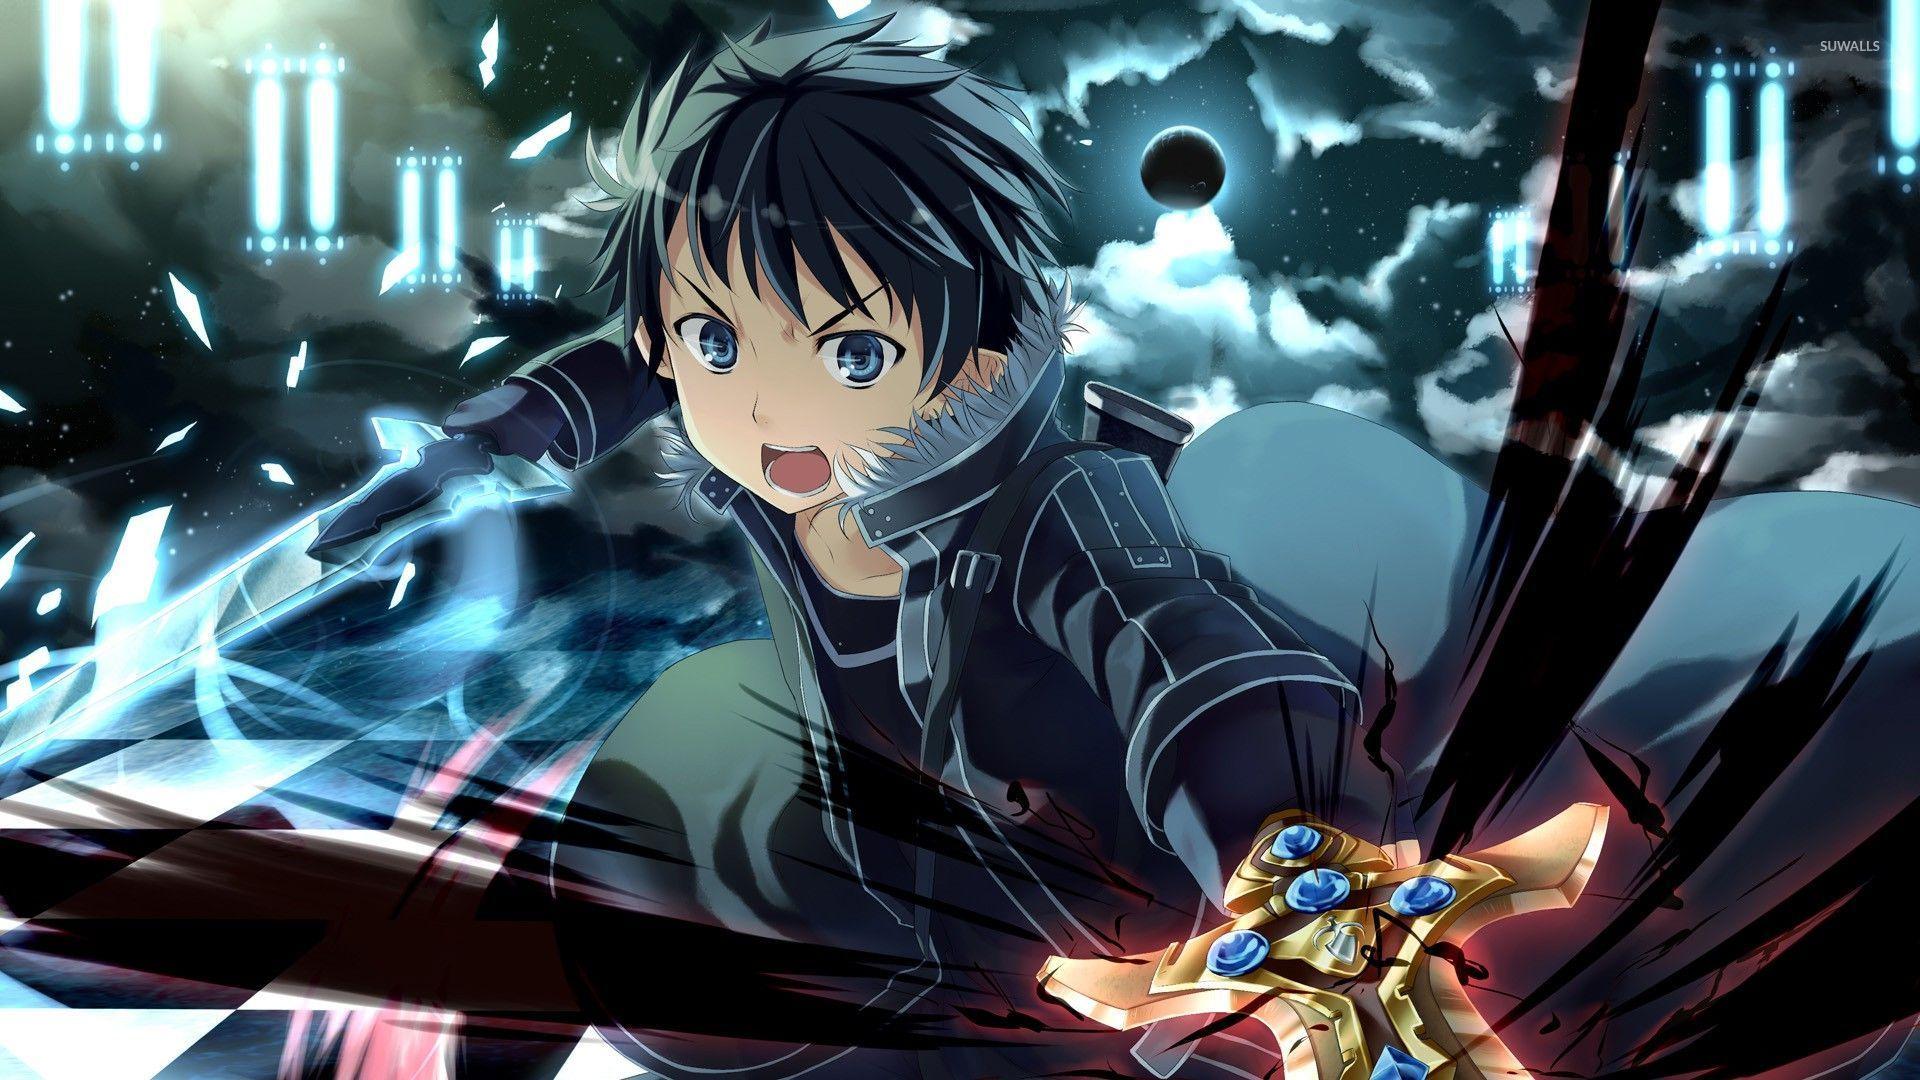 Kirito Sword Art Online 2 Wallpaper Anime Wallpapers 29487